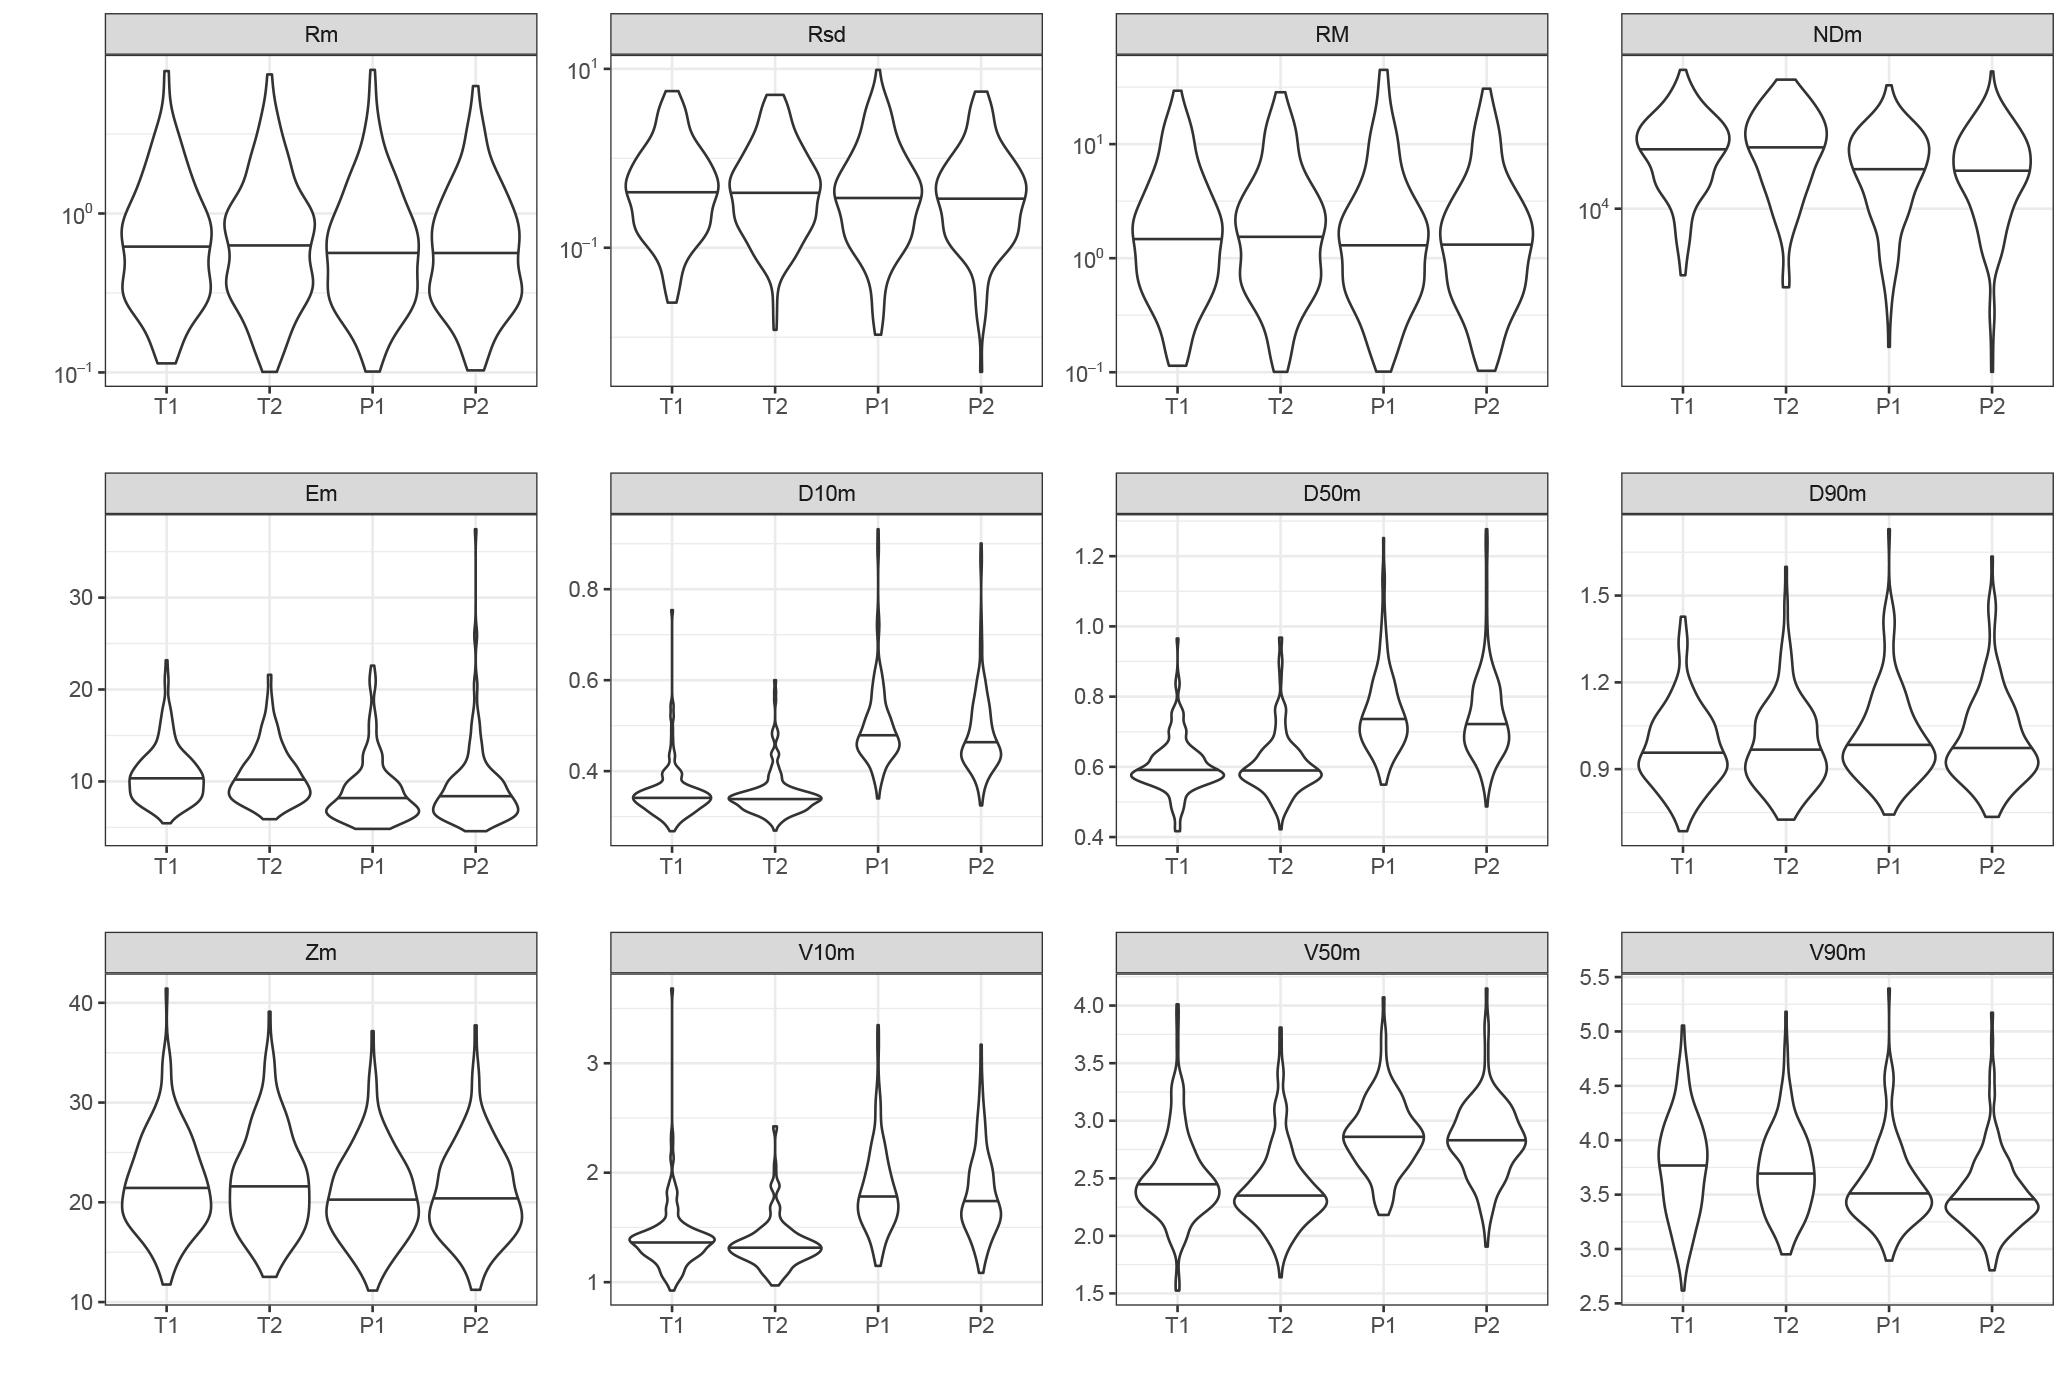 HESS - Comparison of precipitation measurements by OTT